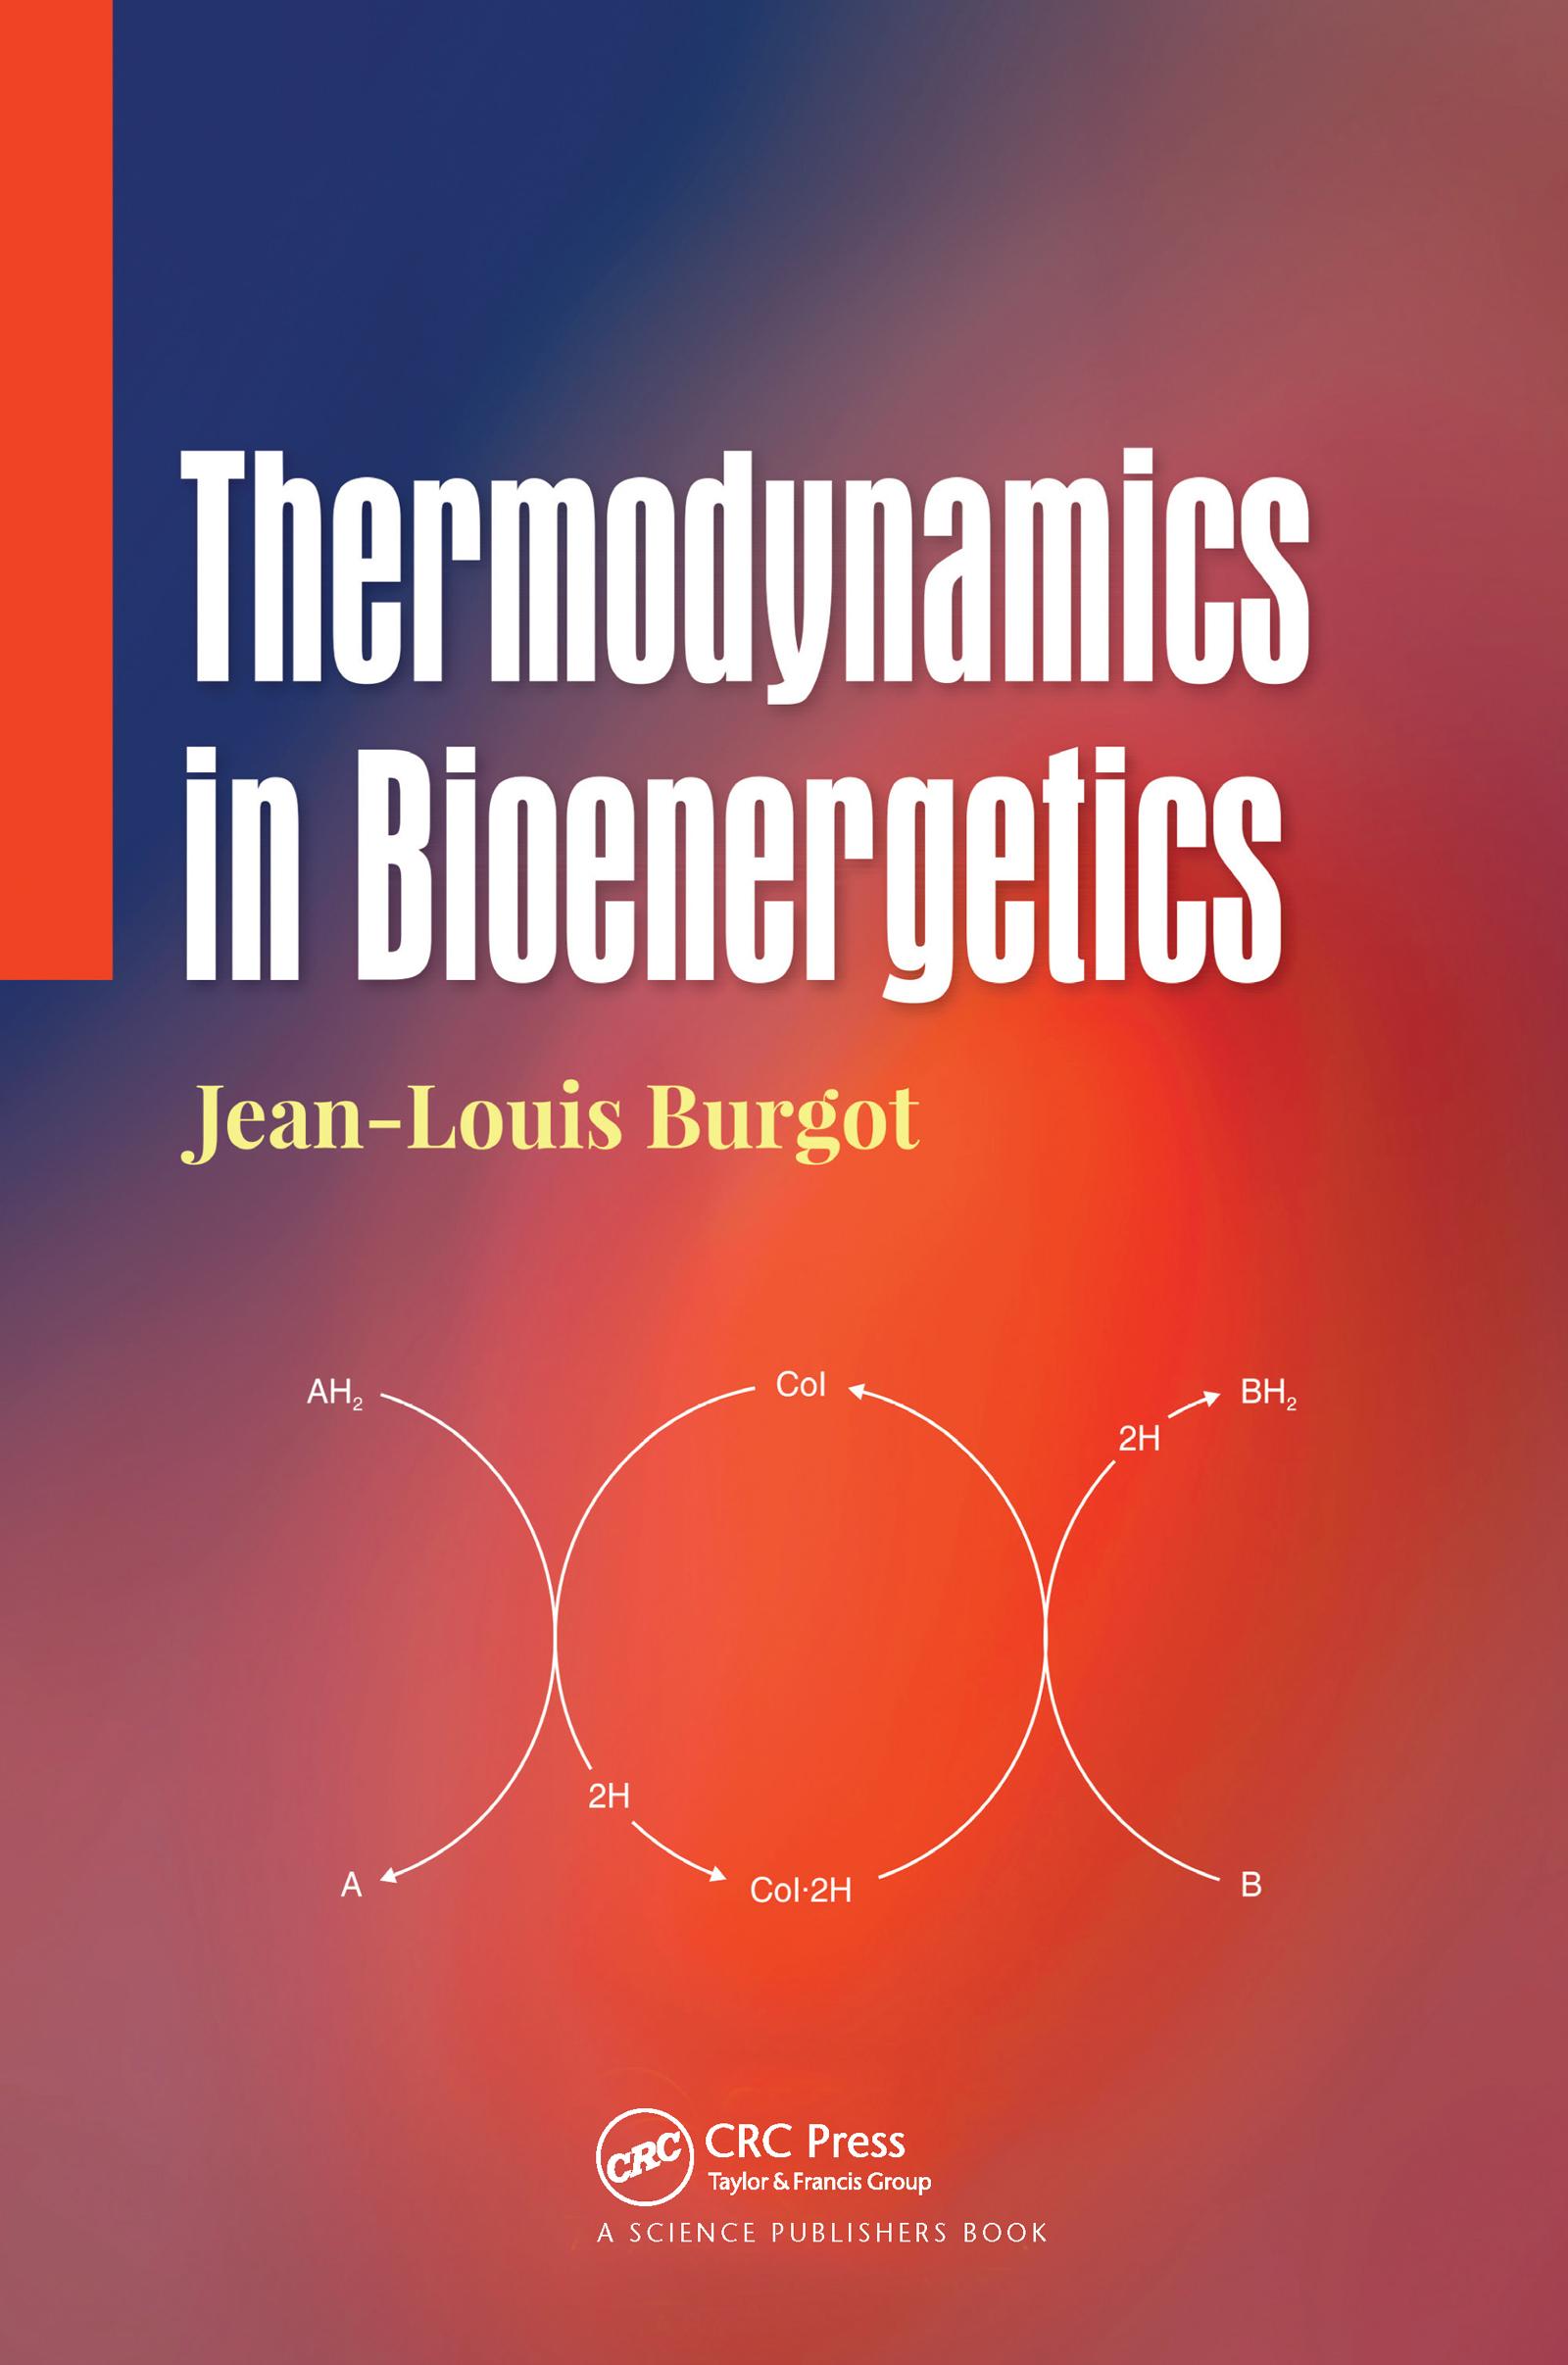 Thermodynamics in Bioenergetics